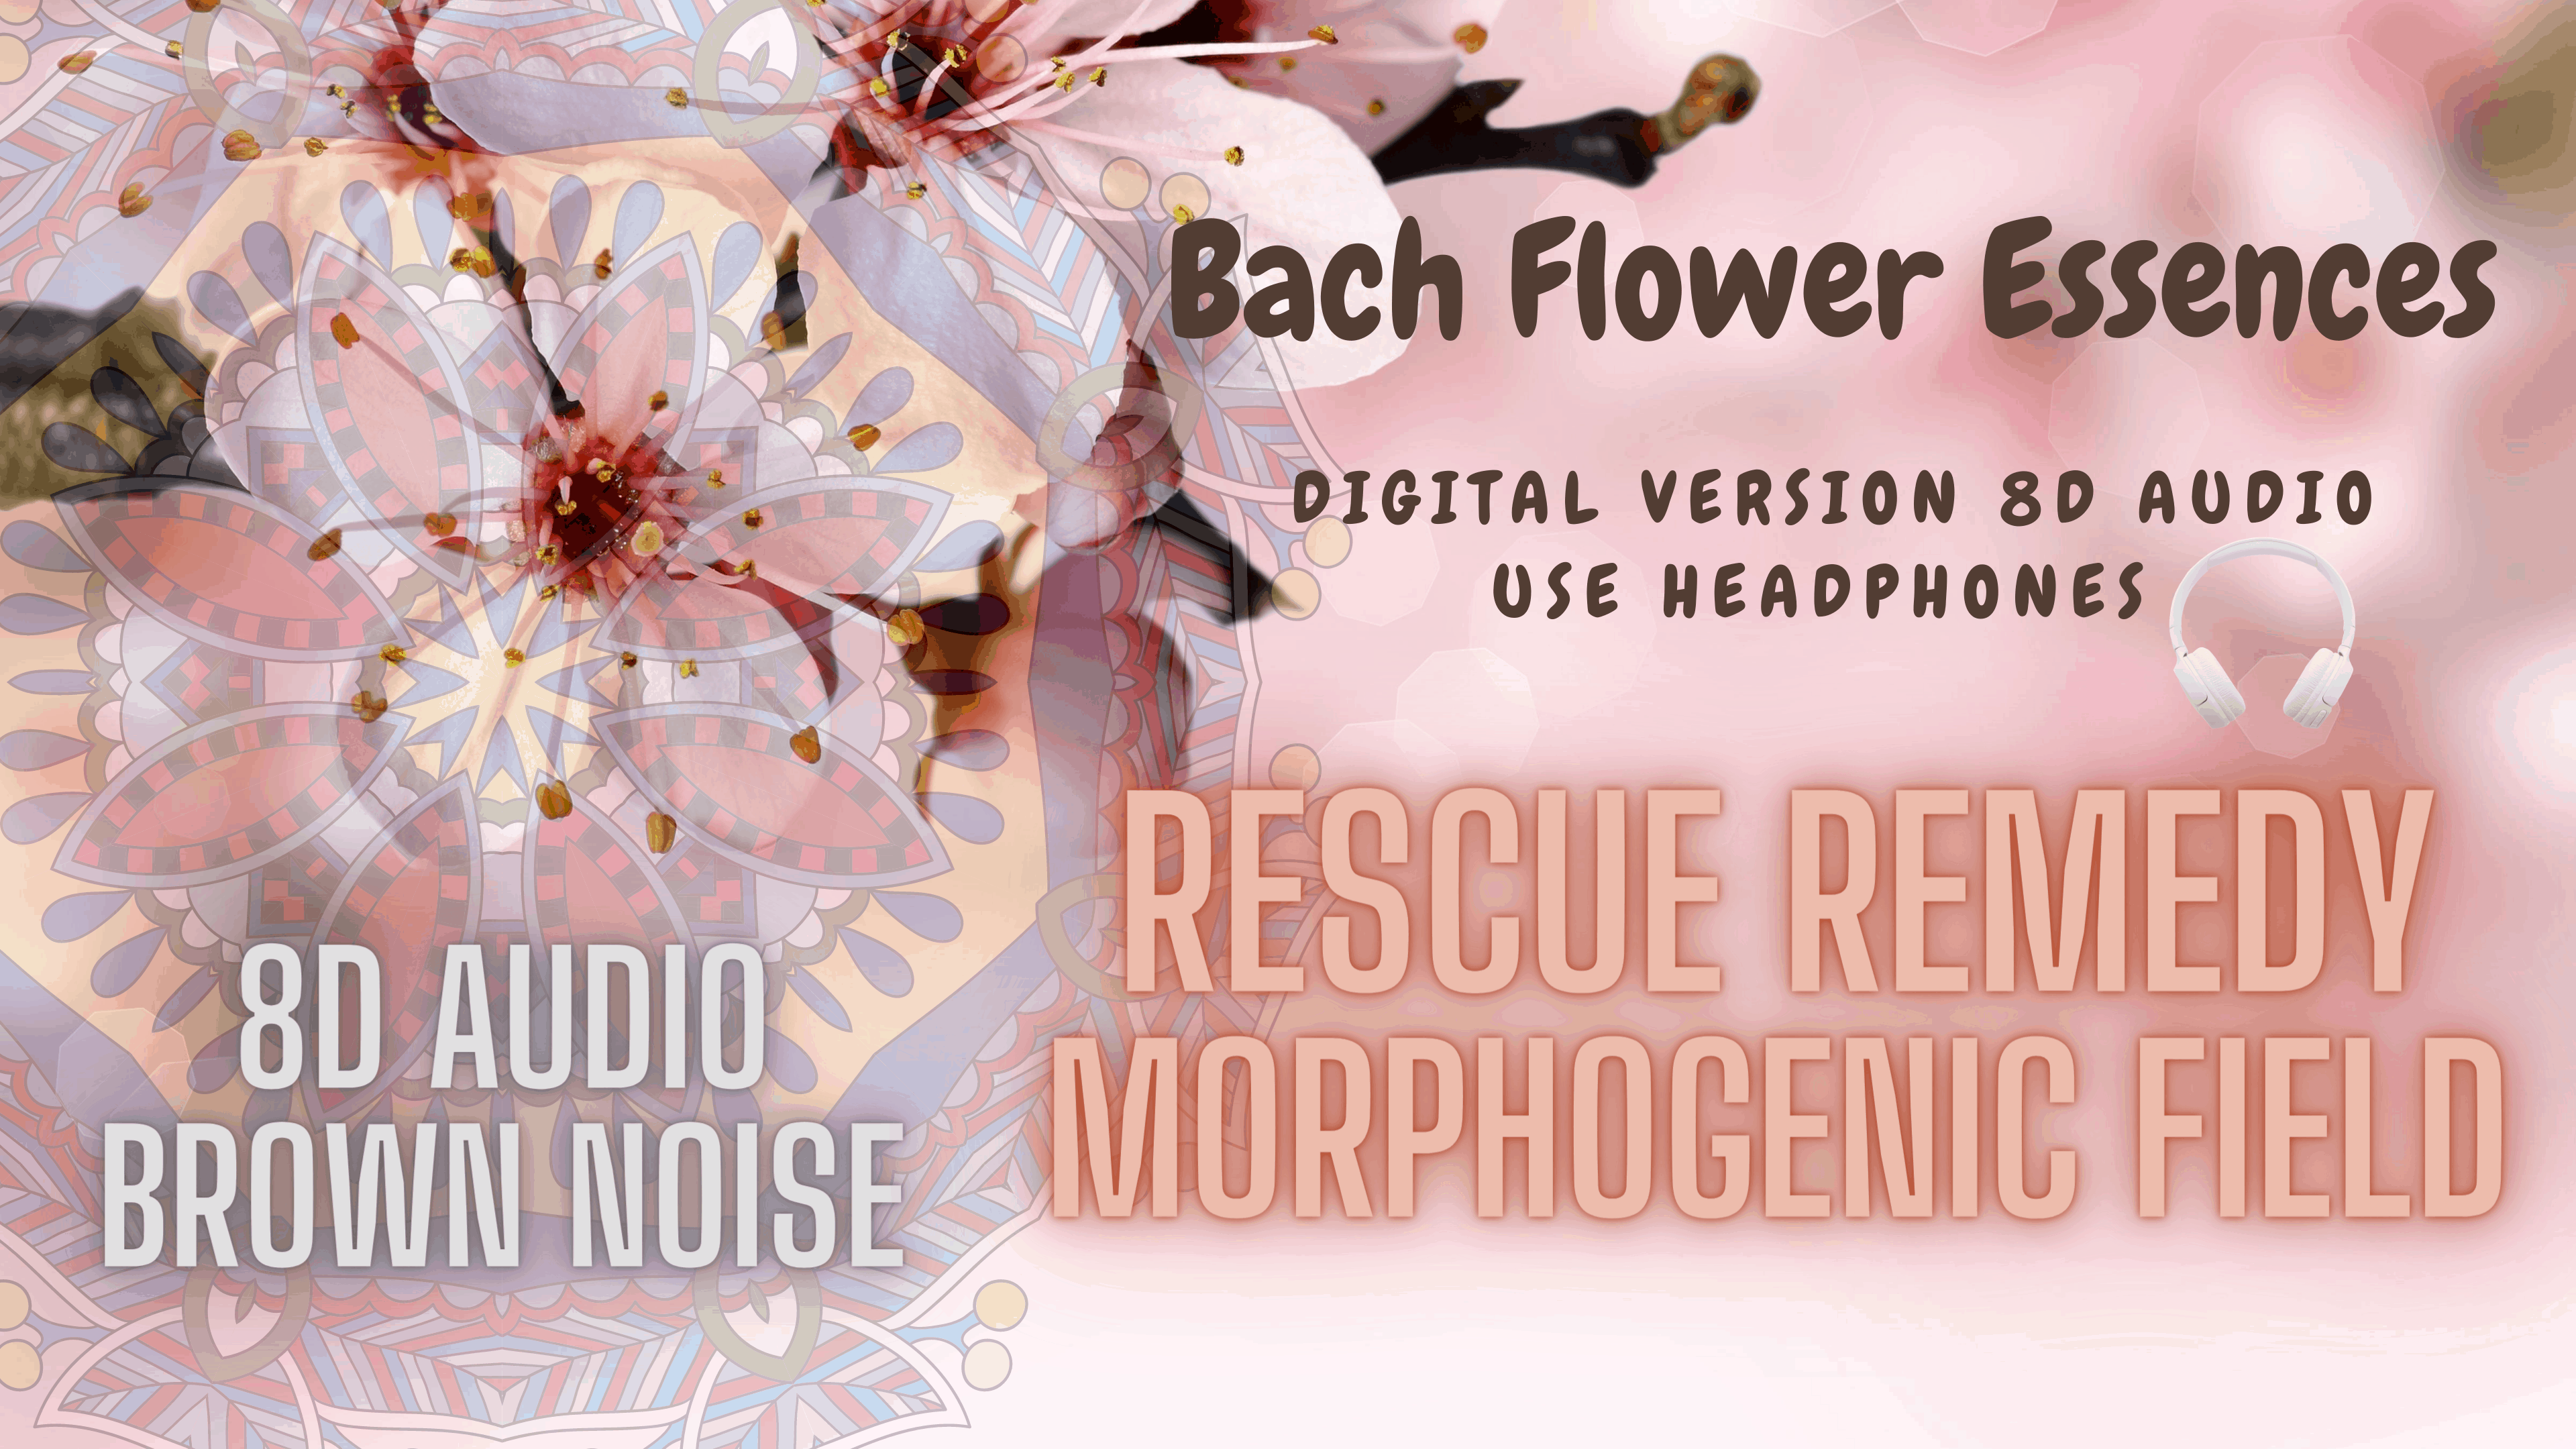 Bach Flower Essence: Rescue Remedy